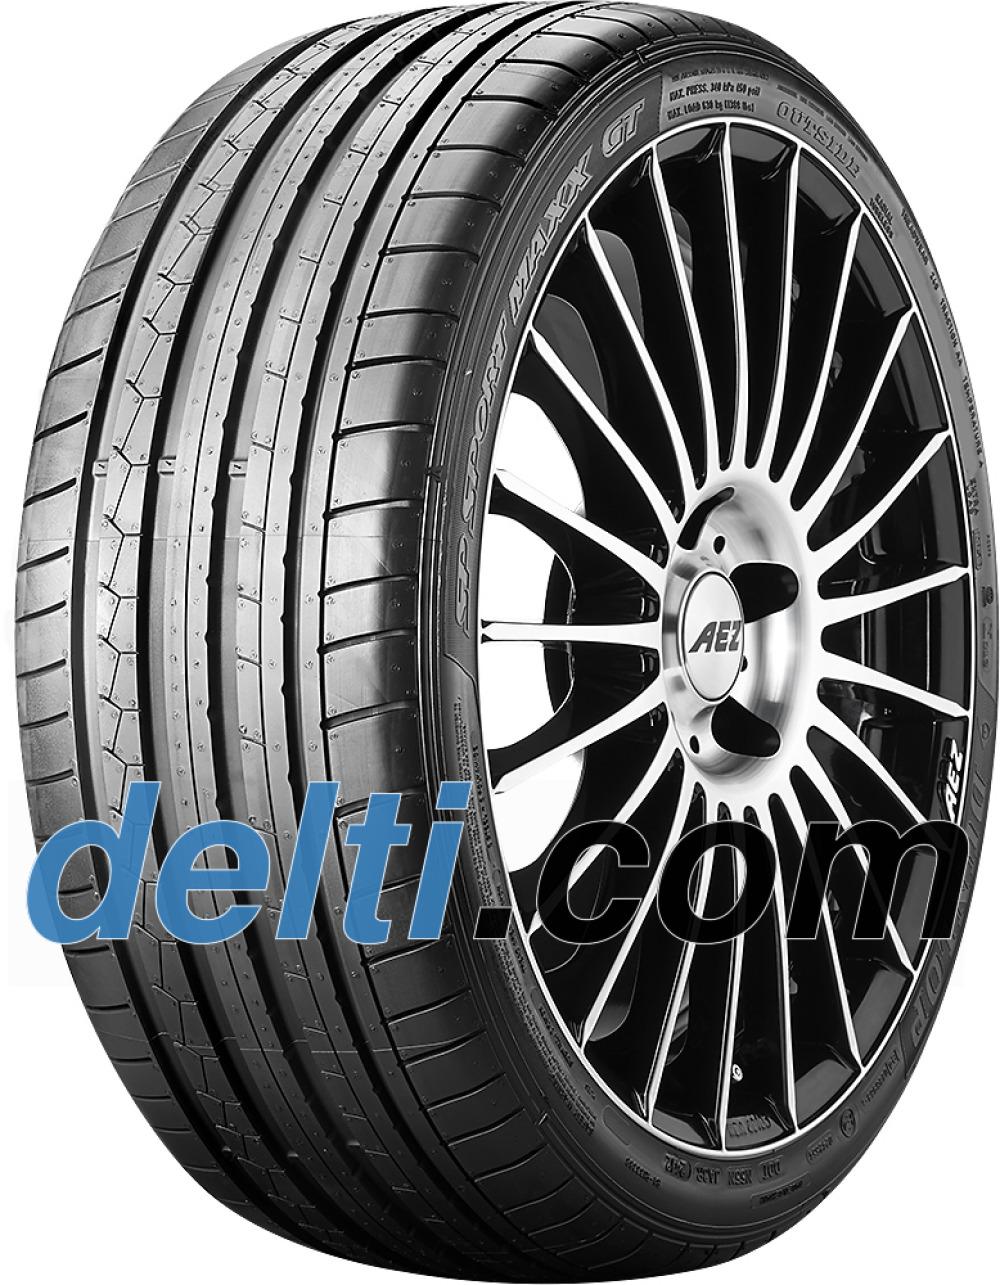 Dunlop SP Sport Maxx GT ( 265/30 ZR19 (93Y) XL met velgrandbescherming (MFS) )